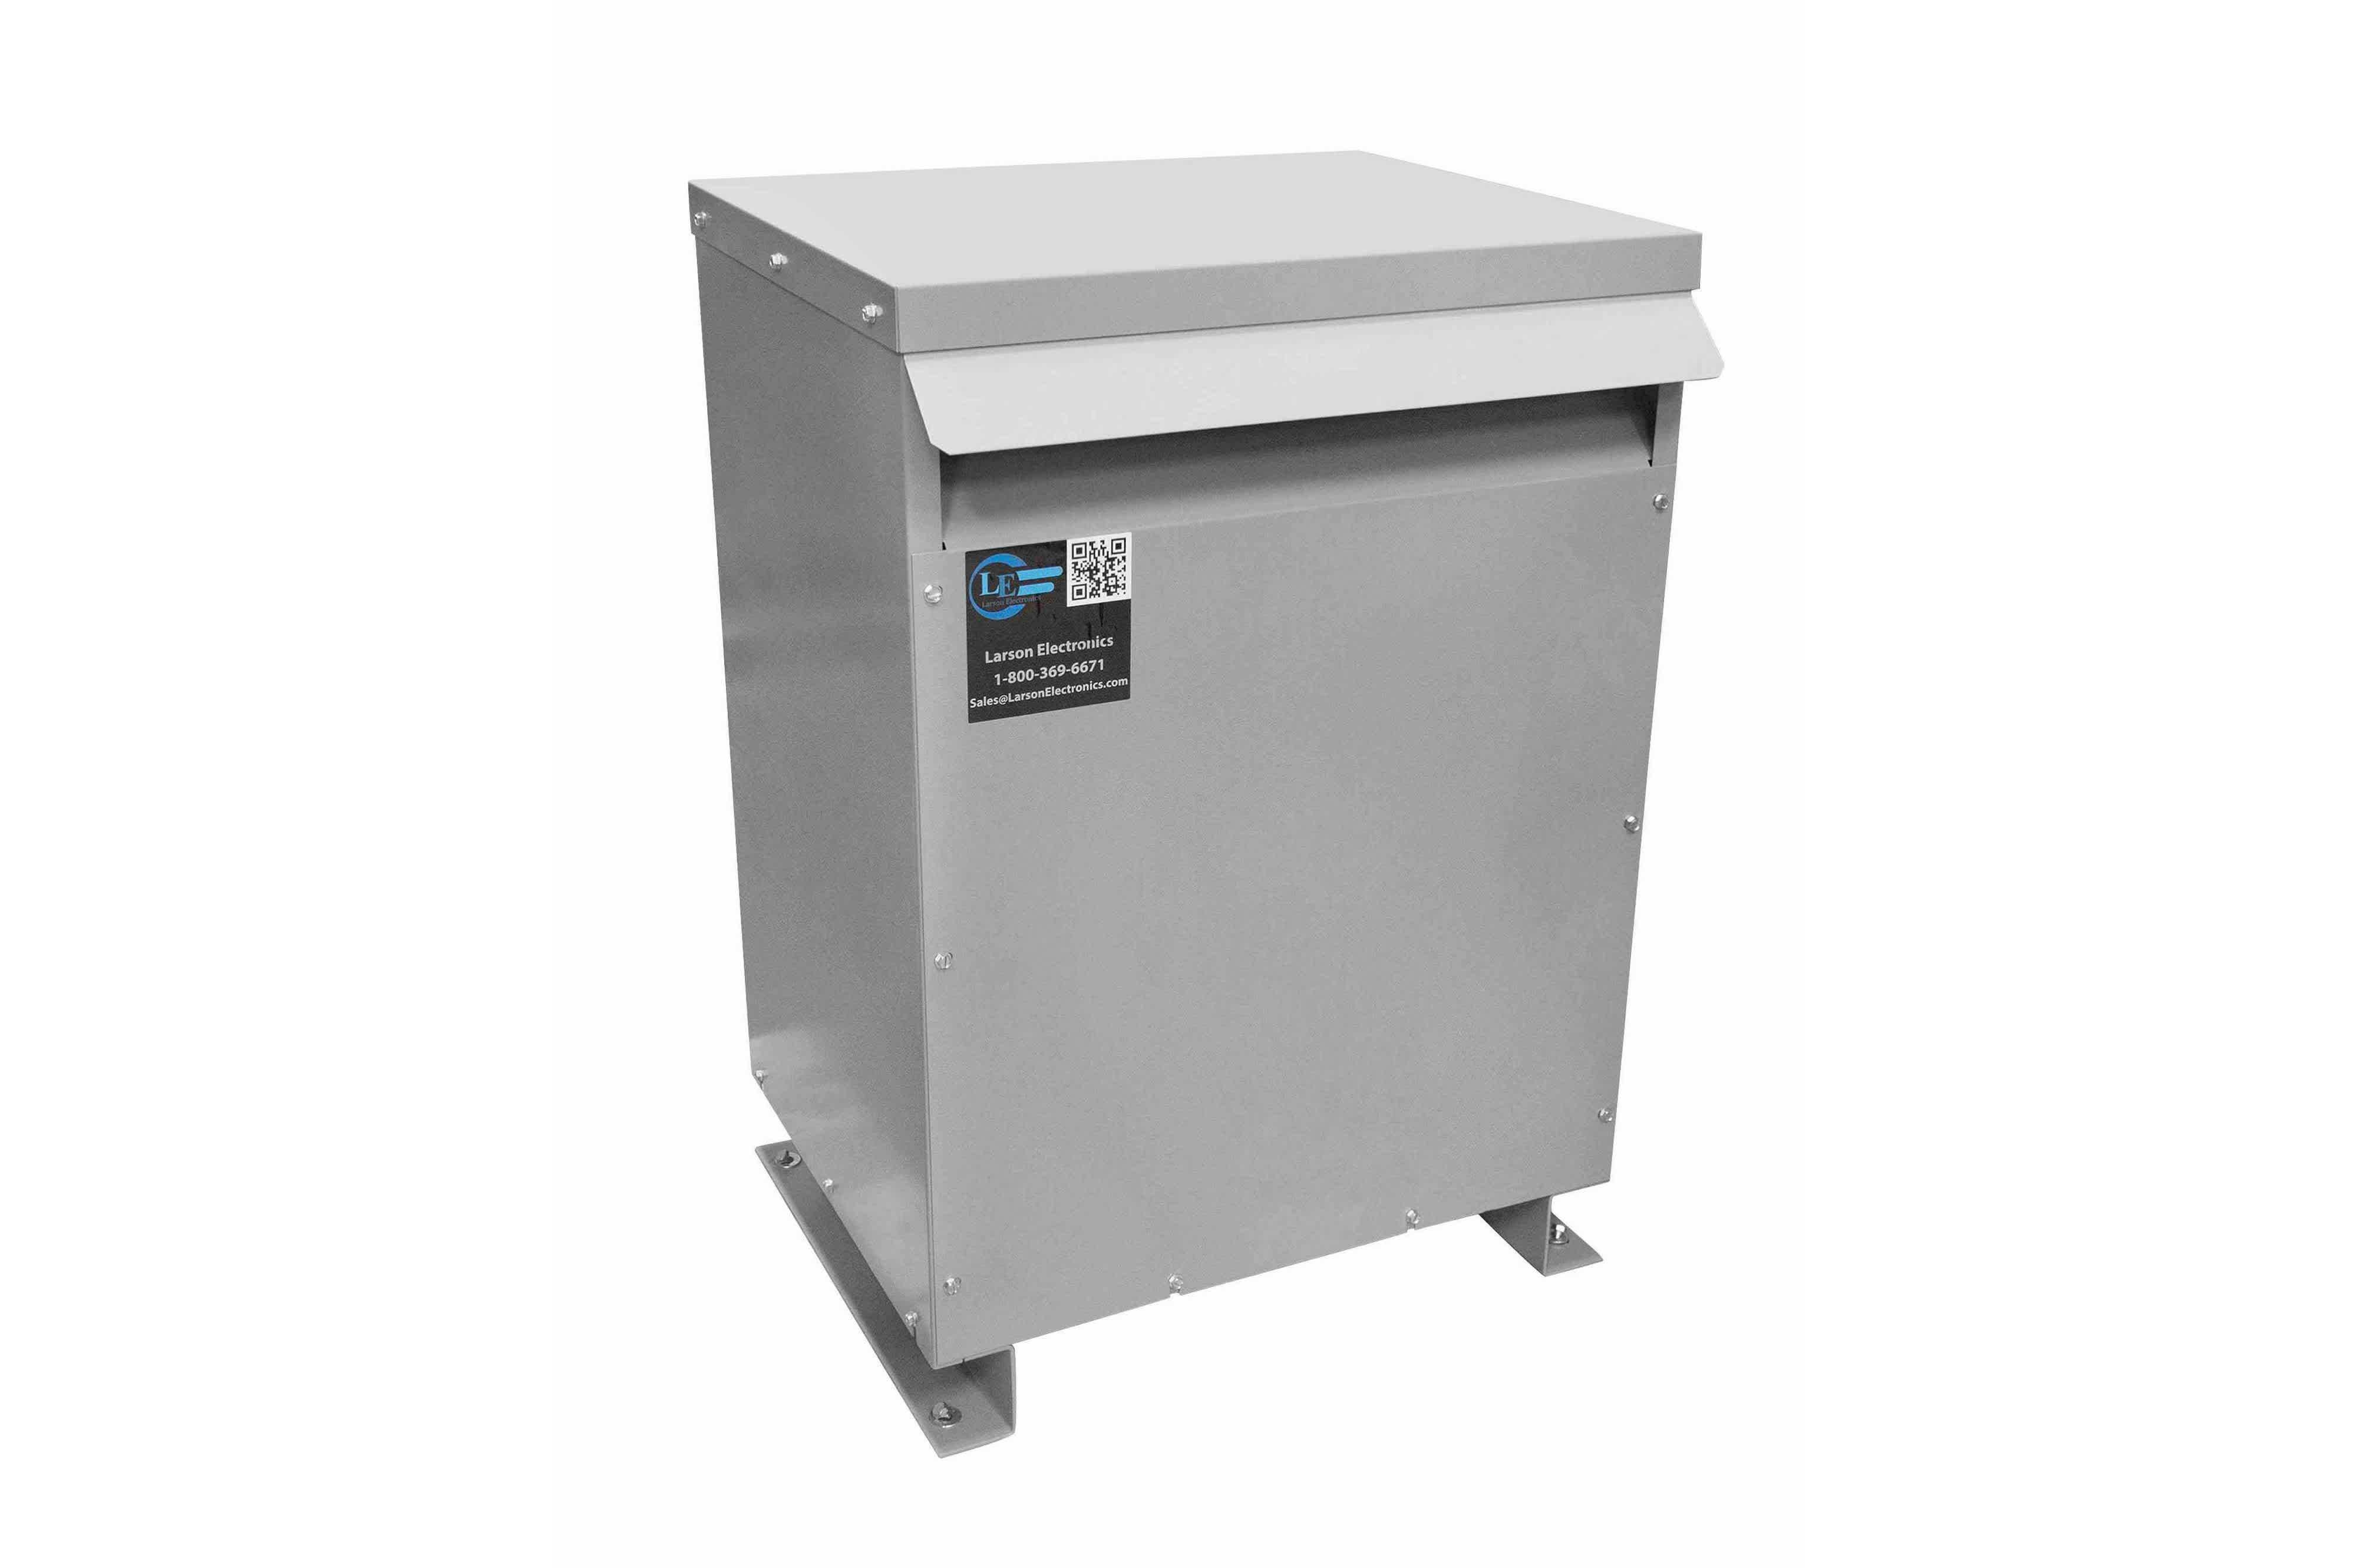 237.5 kVA 3PH Isolation Transformer, 380V Wye Primary, 600Y/347 Wye-N Secondary, N3R, Ventilated, 60 Hz